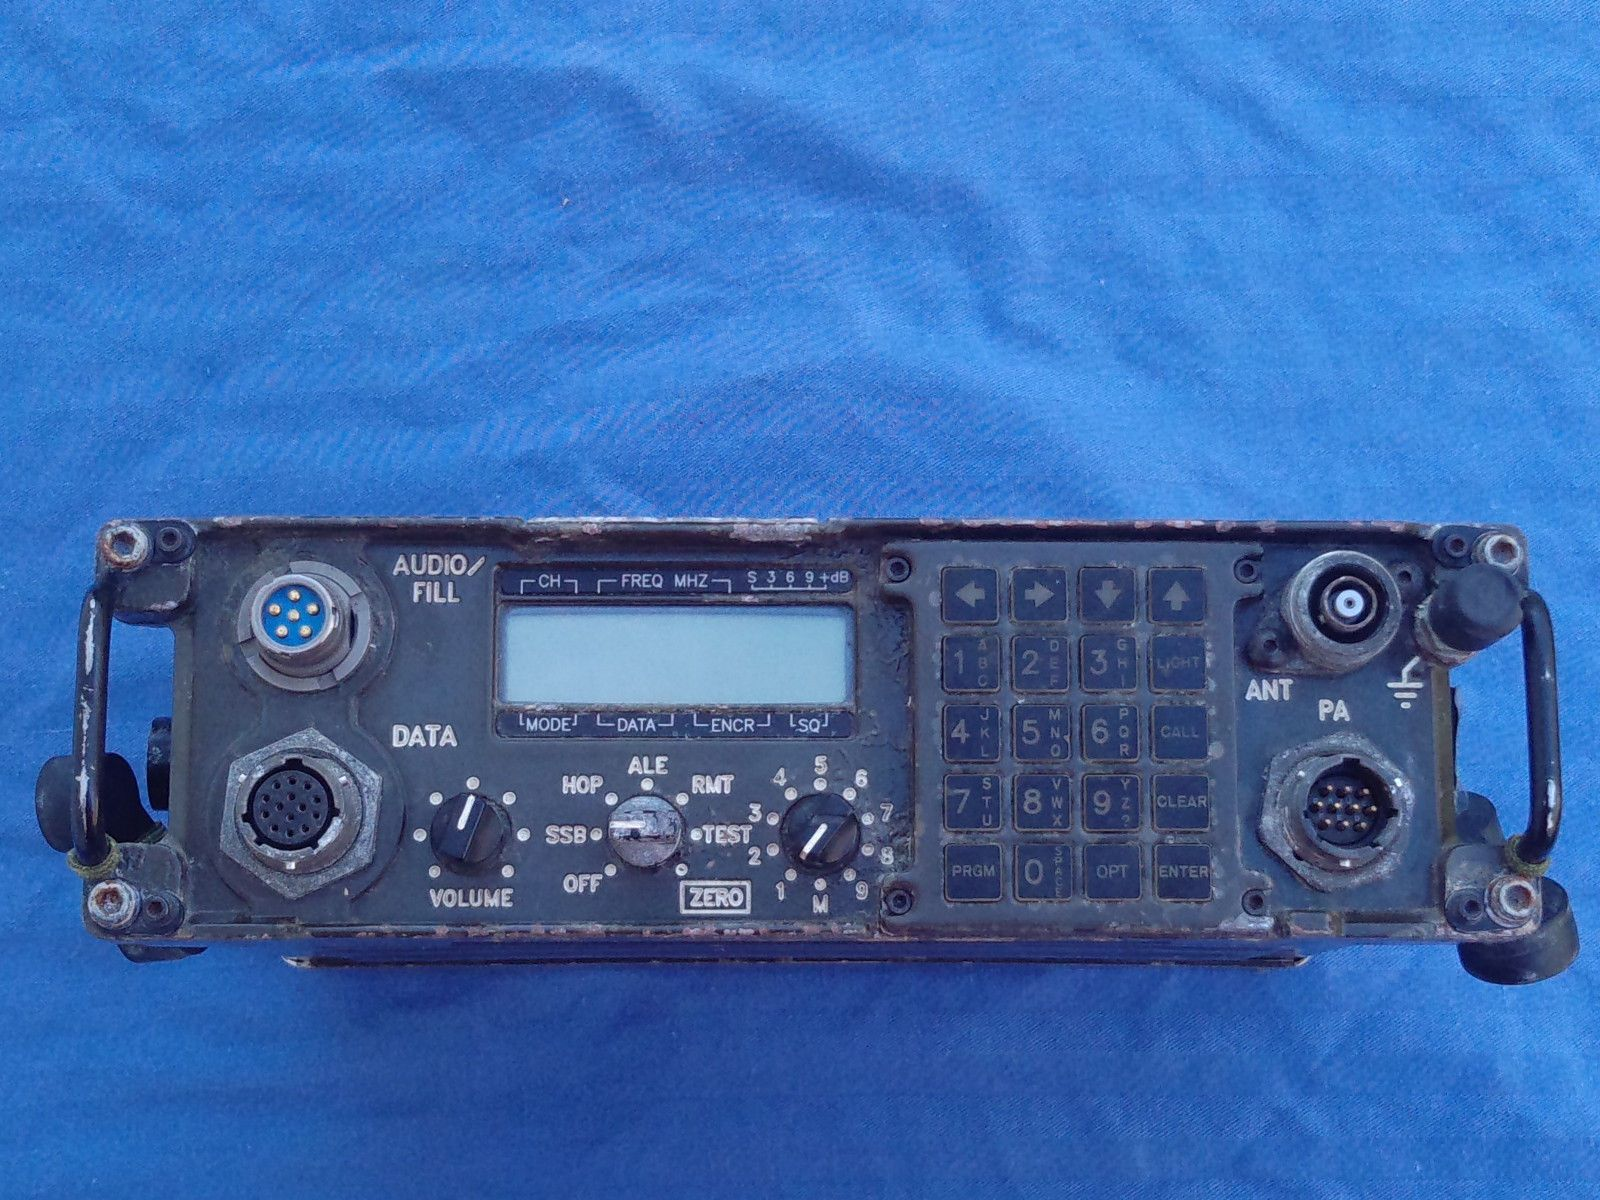 PRC 138 HF Manpack Radio RT 1694 Military Transciever   eBay